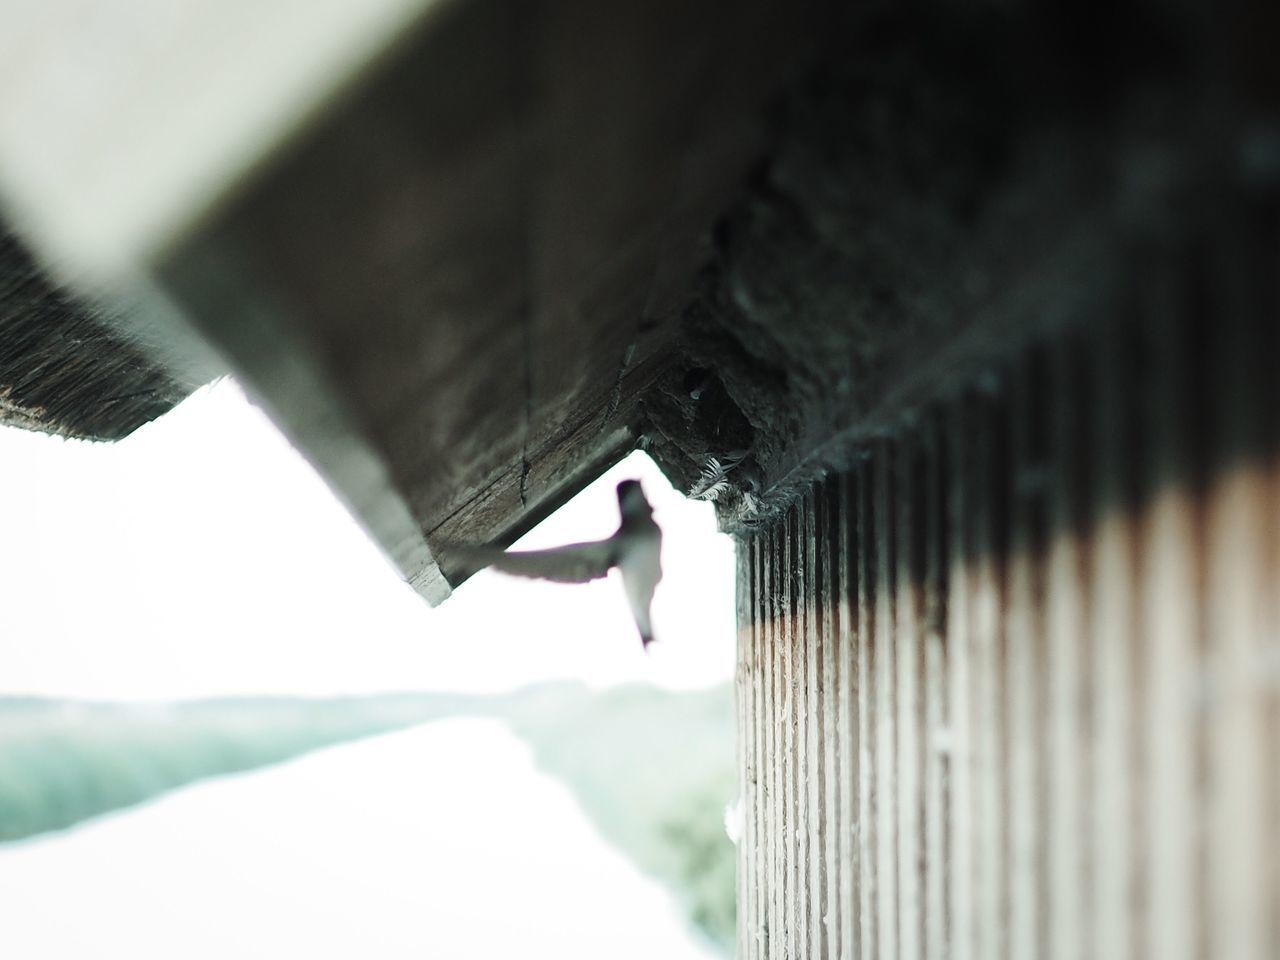 Swallow Bird Birds Nest Bygholm Vejle M.Zuiko 45mm 1:1,8